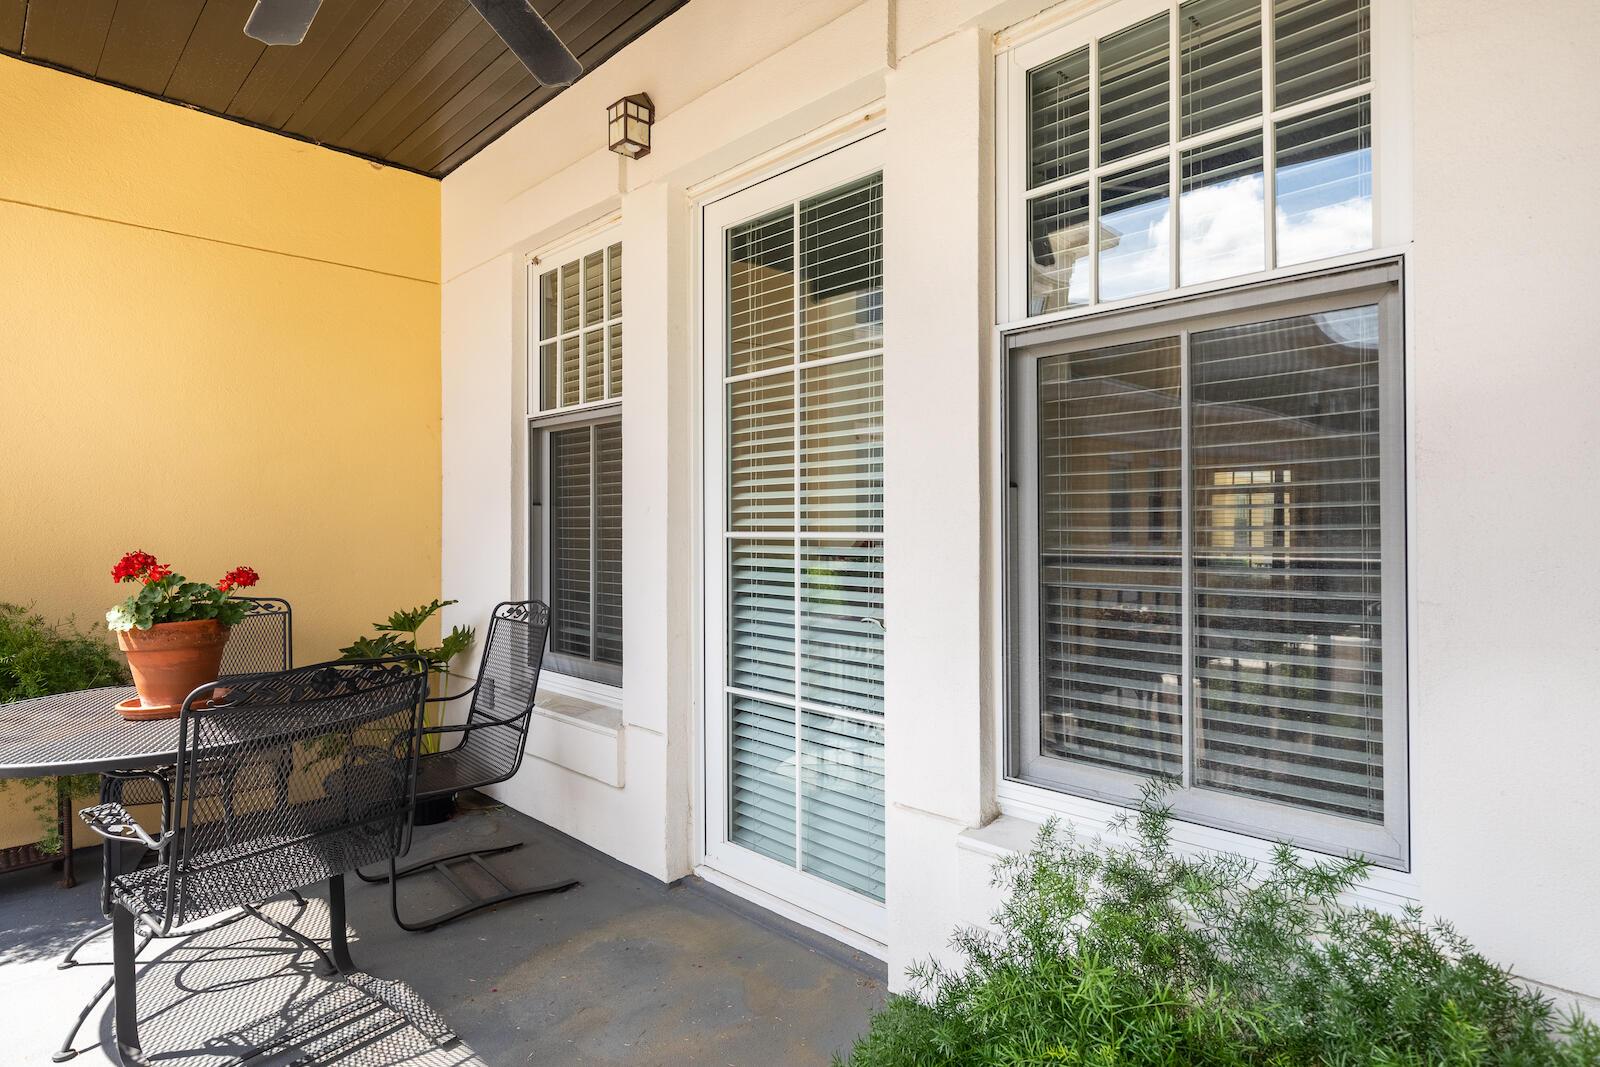 Albemarle Condos For Sale - 498 Albemarle, Charleston, SC - 7